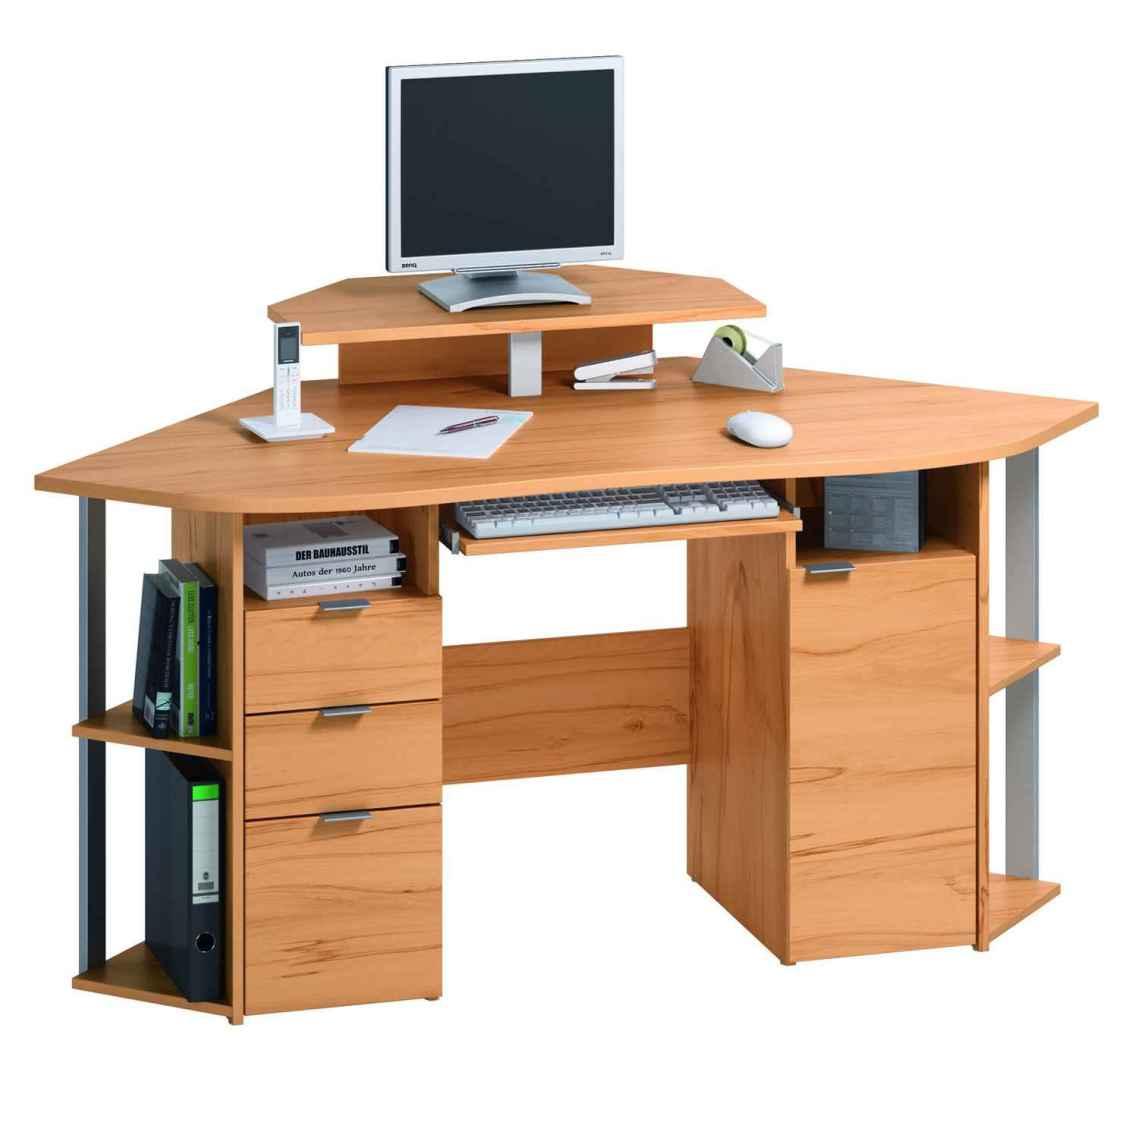 Small Corner Desk With Drawers Decor Ideasdecor Ideas